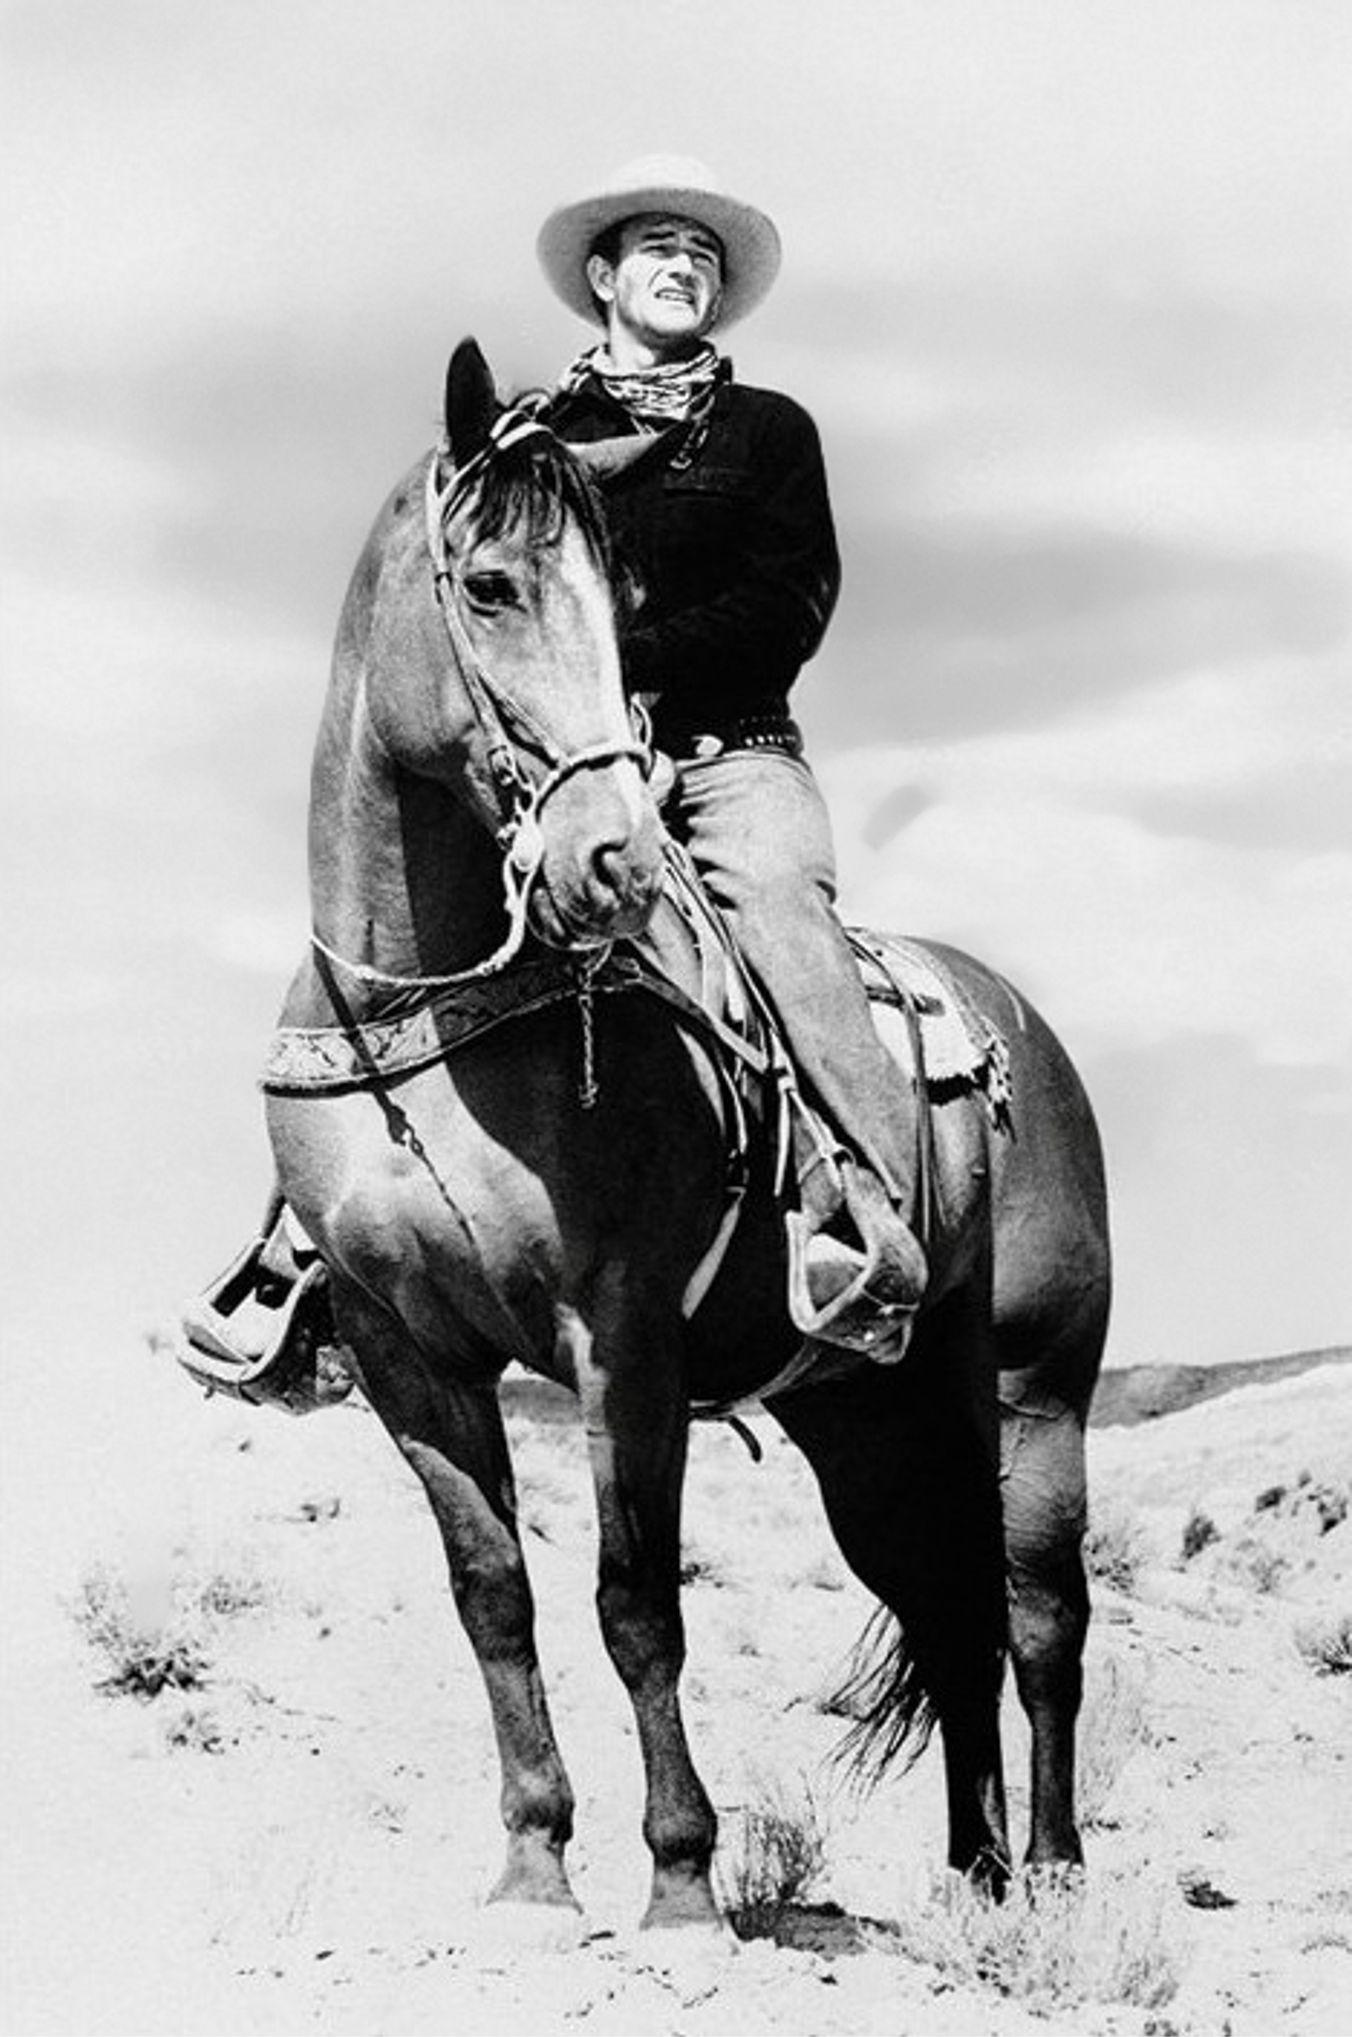 John Wayne Iconic Images Part 2 My Favorite Westerns